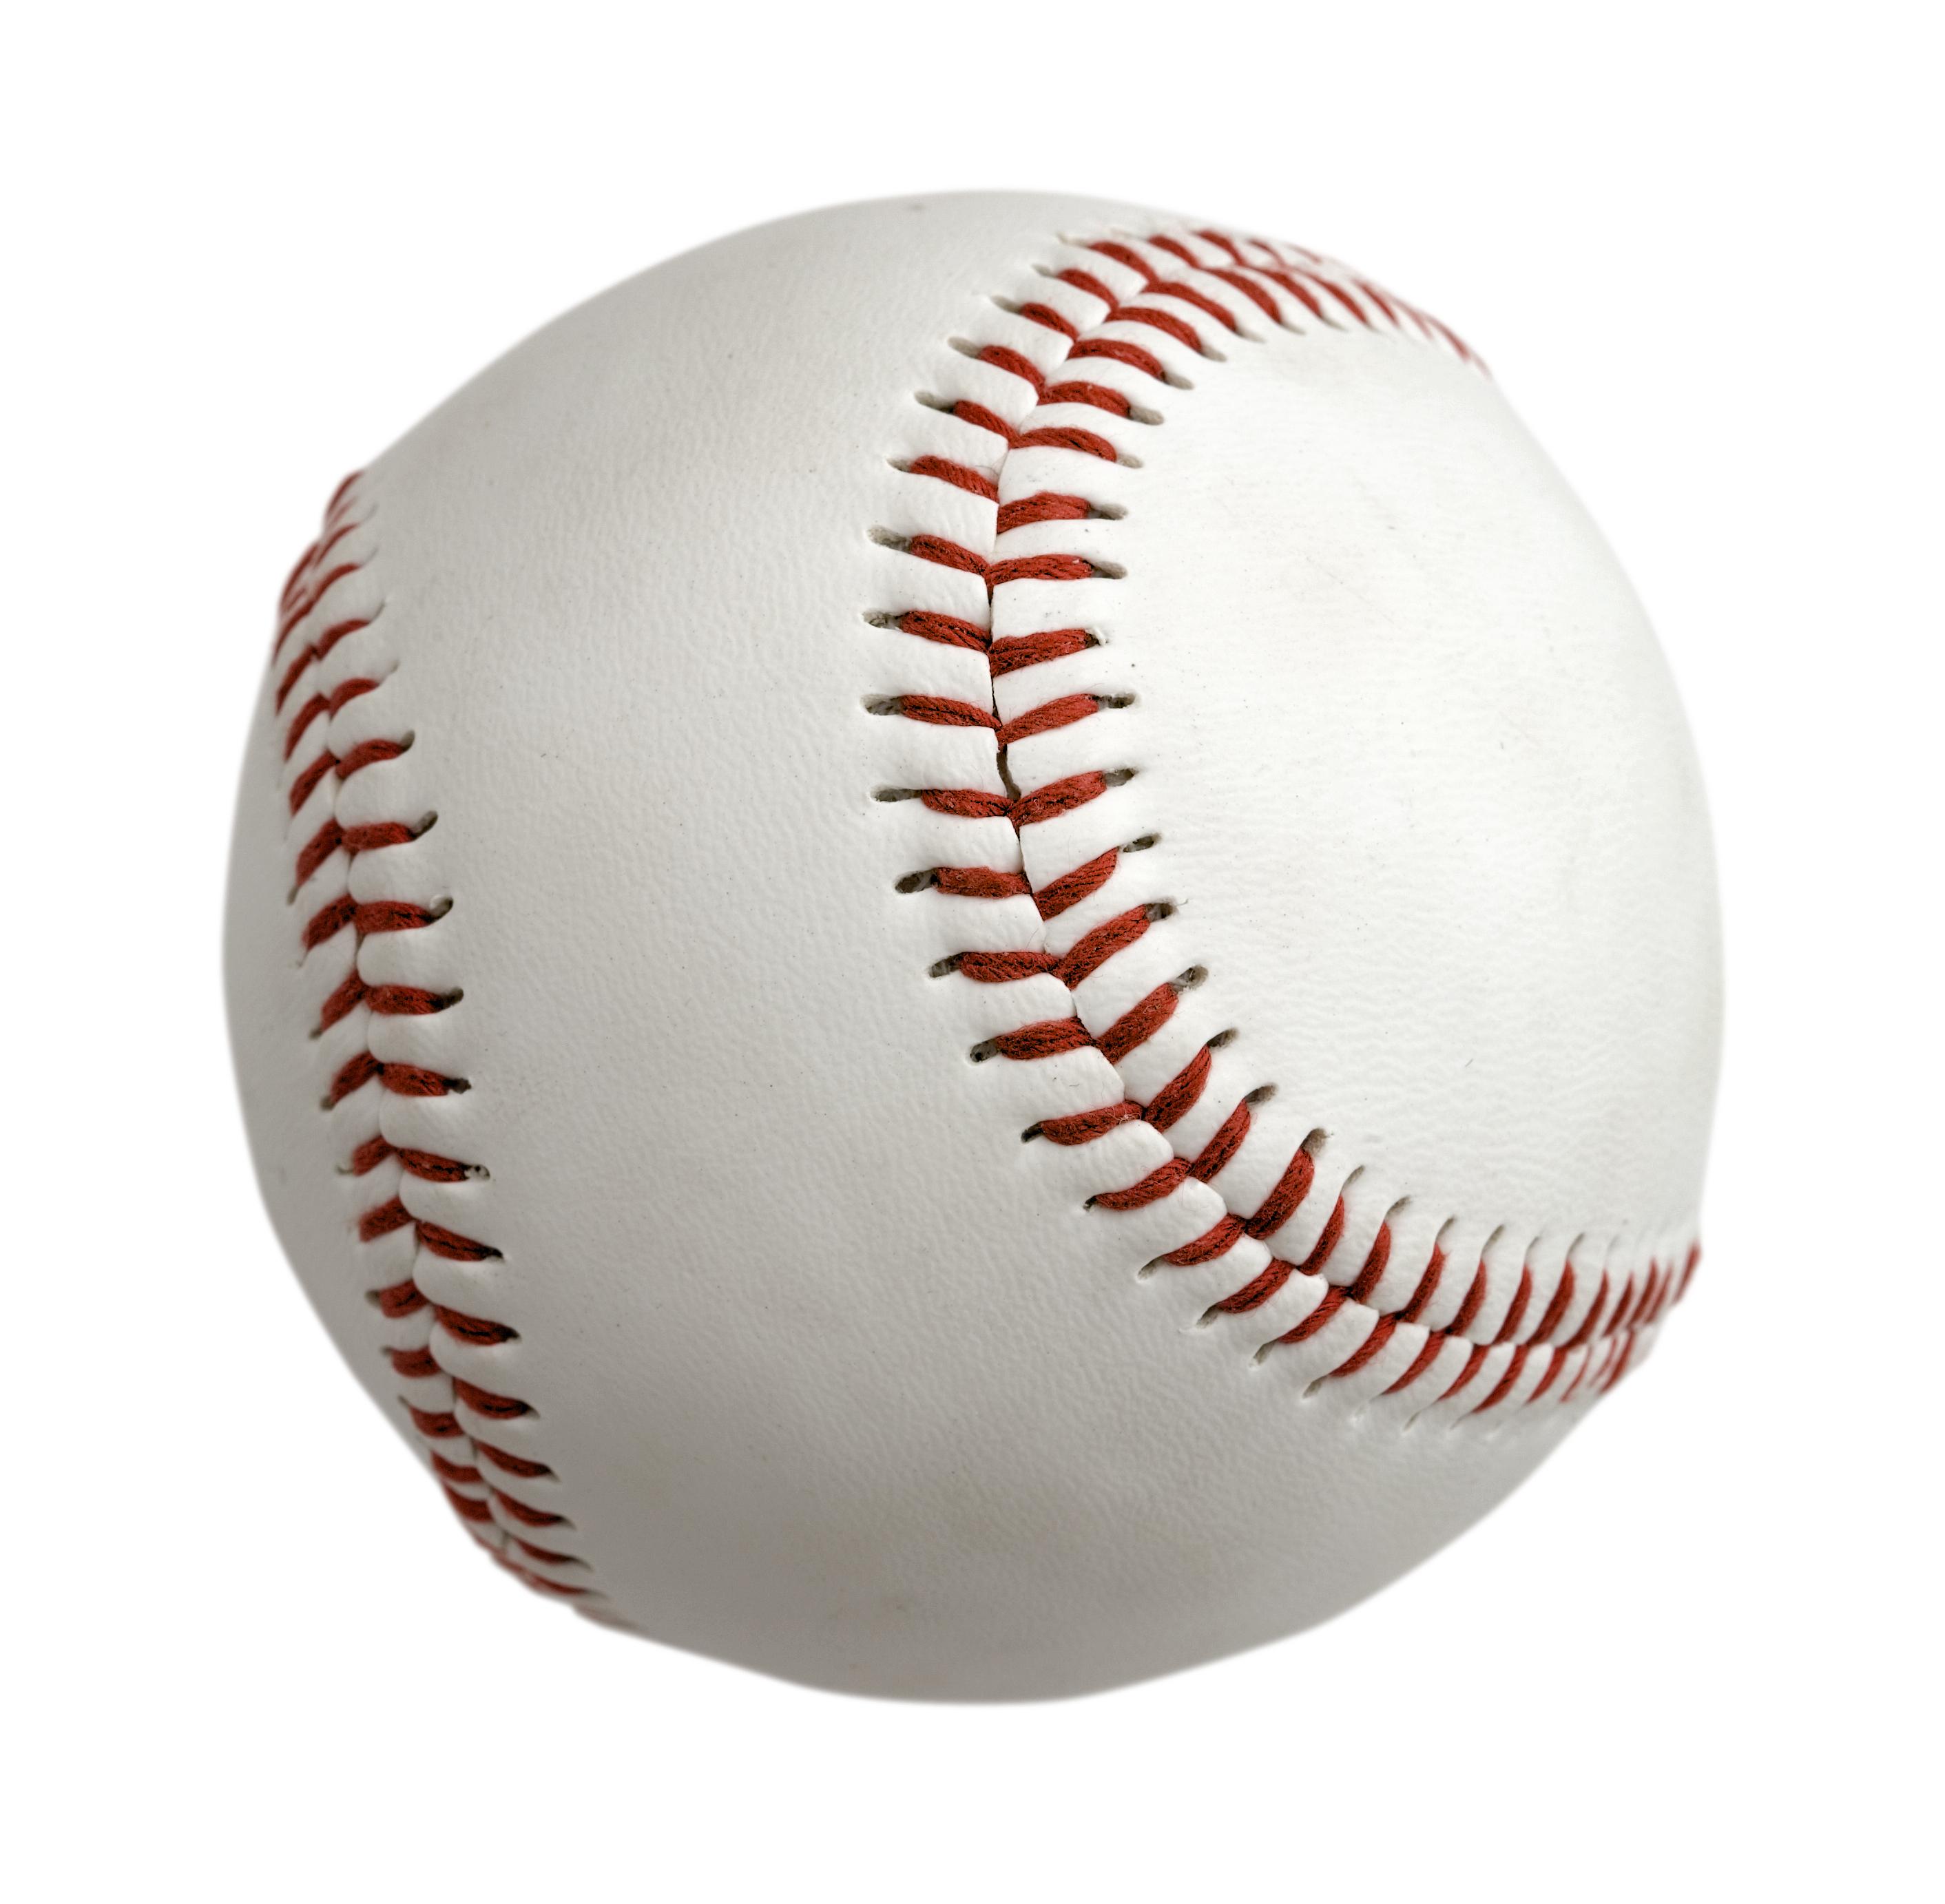 Baseball ball isolated on white background – 951 The Bull